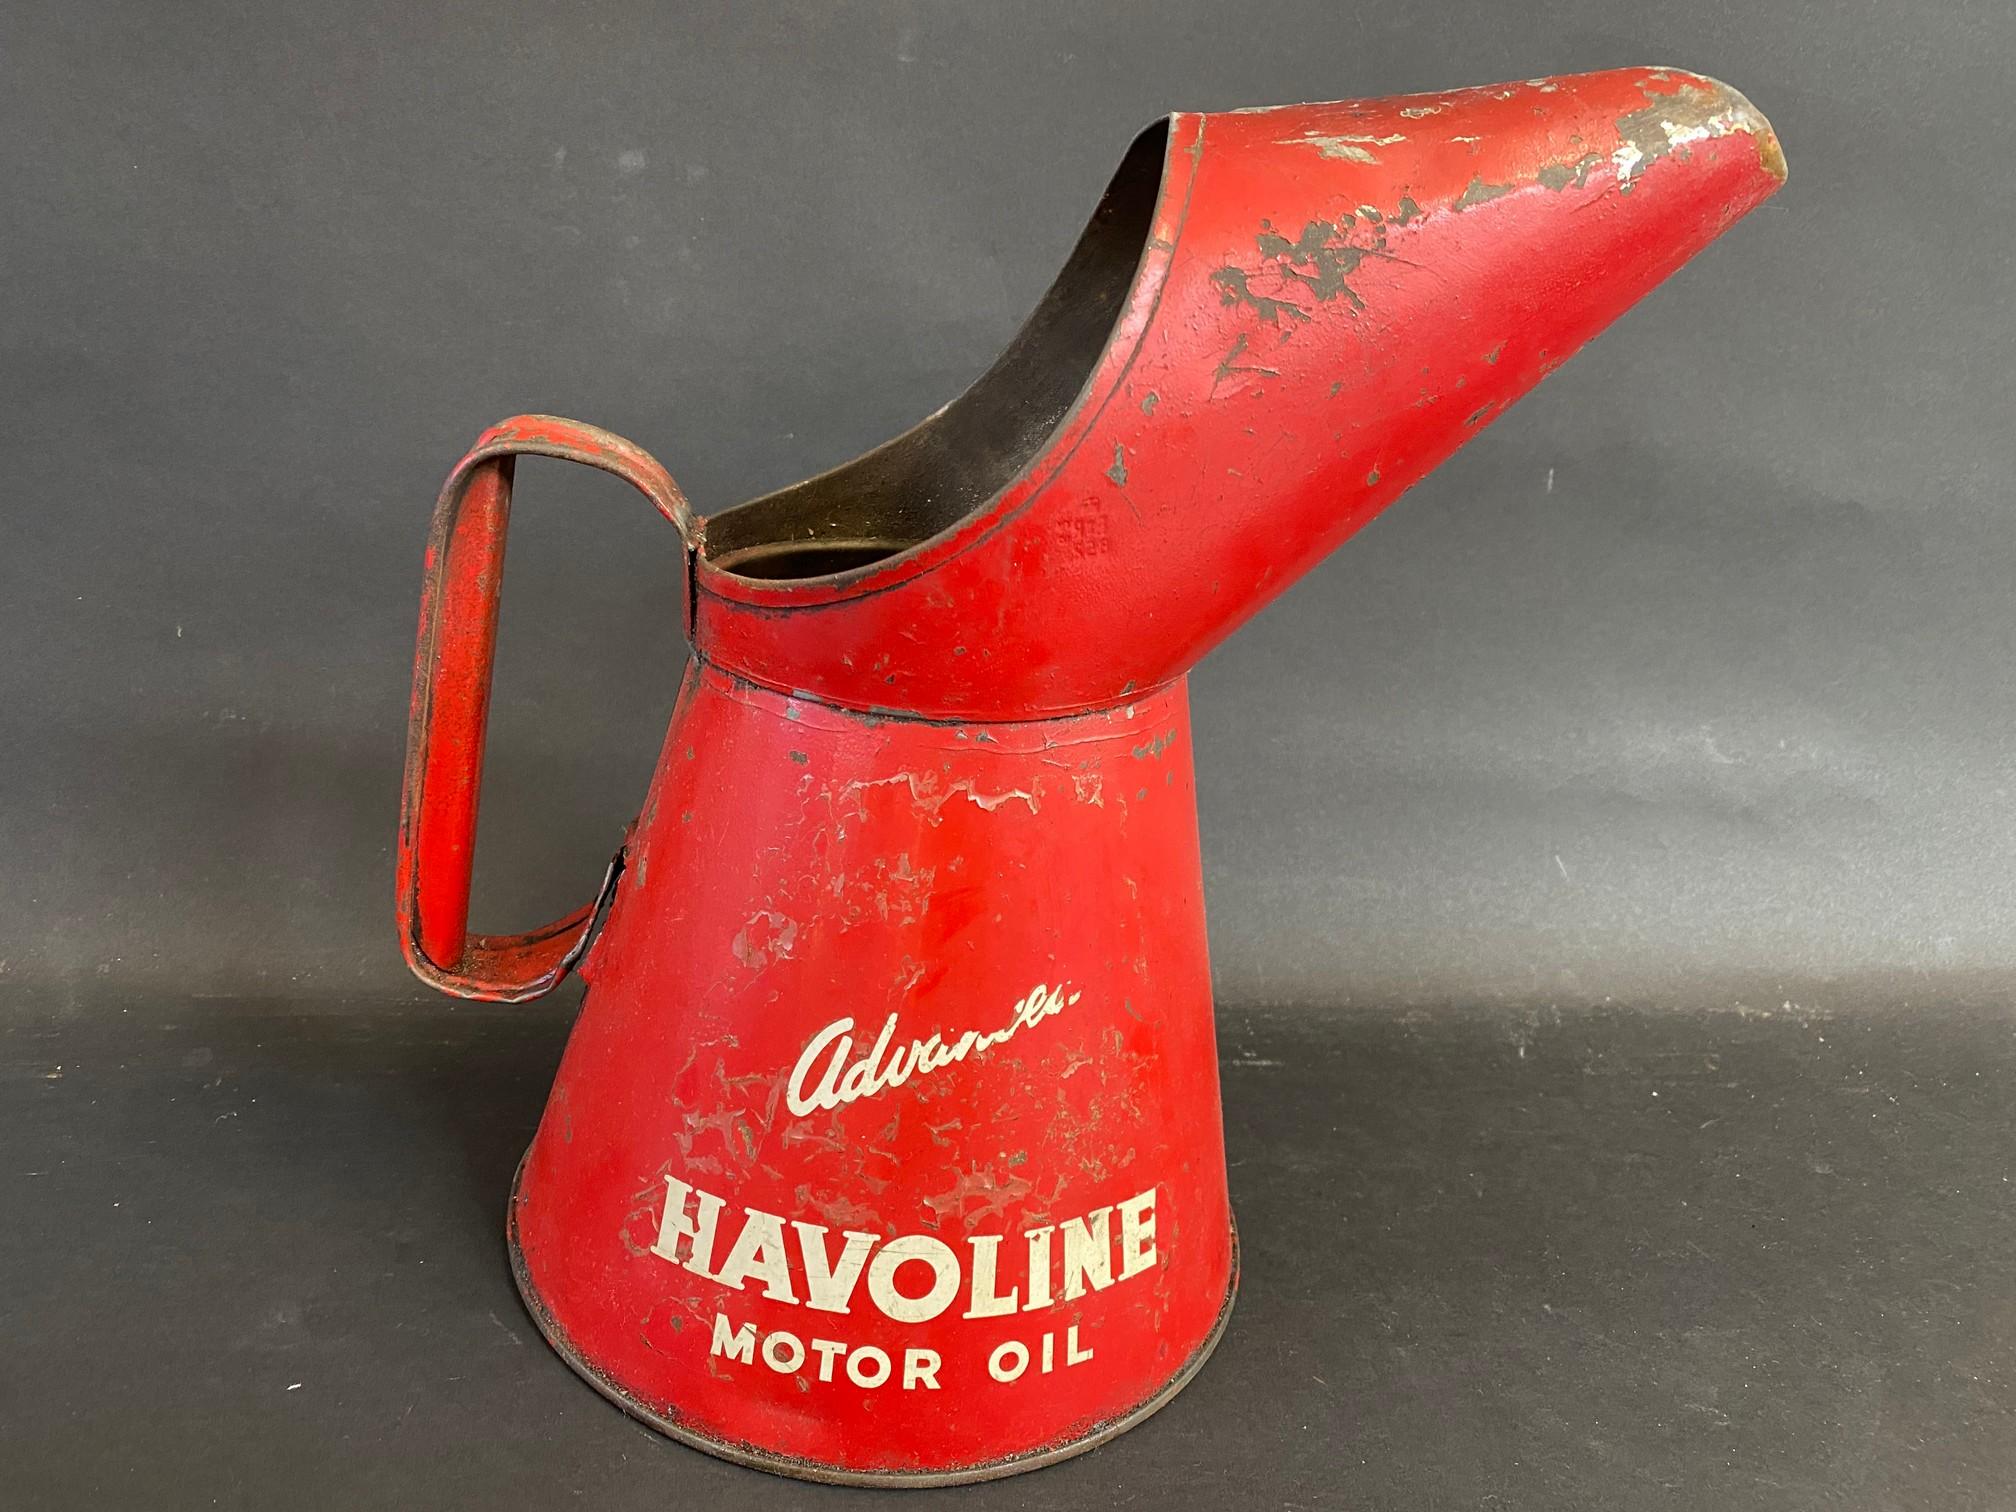 A Havoline Motor Oil half gallon measure. - Image 2 of 4